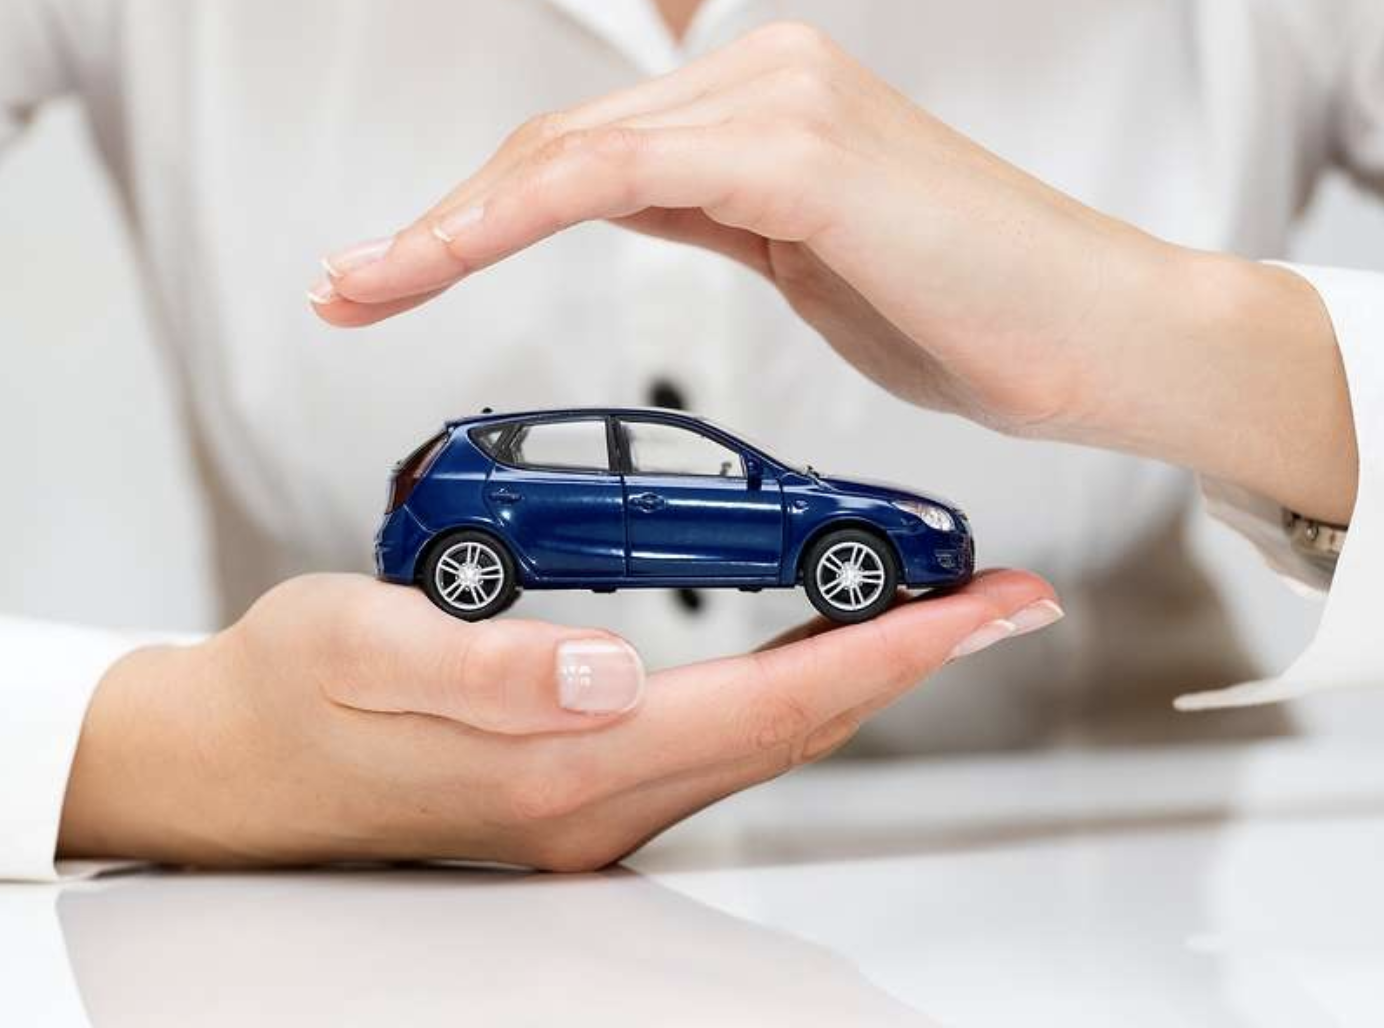 Manfaat Asuransi Kendaraan MSIG, Berkendara Tanpa Cemas